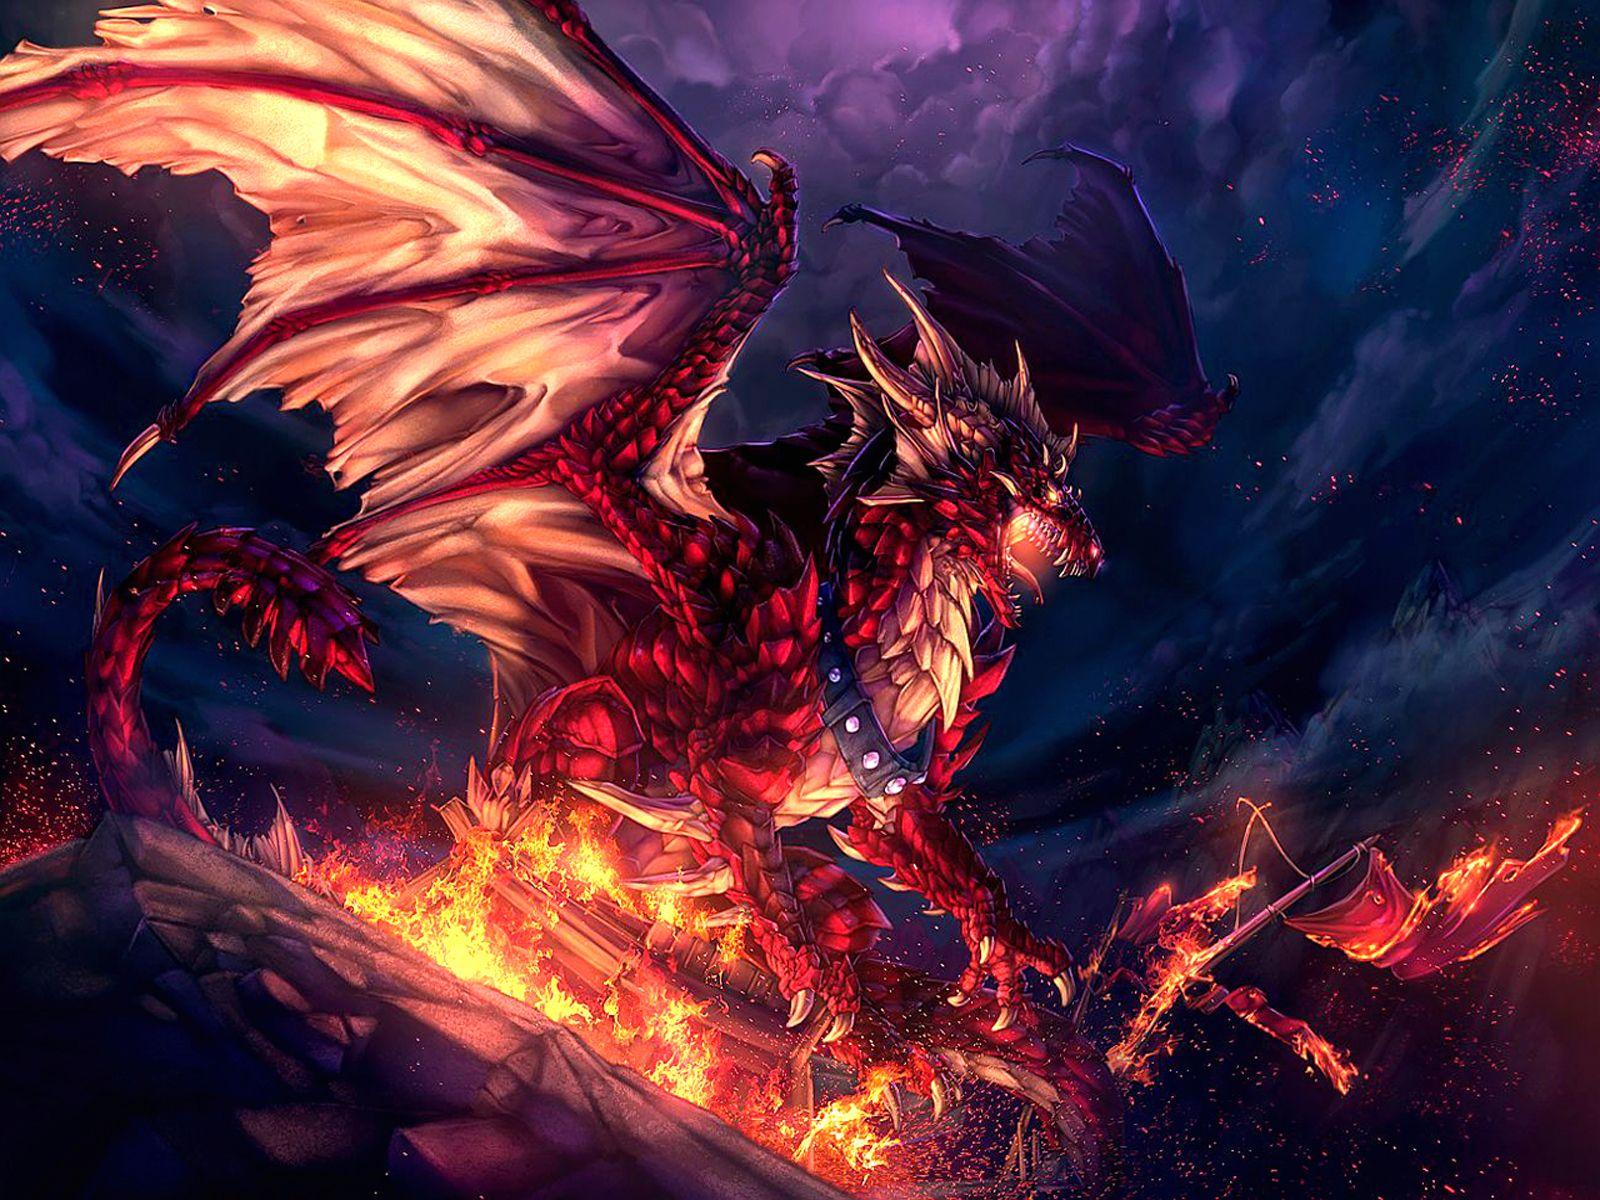 Fire Dragon Android Wallpapers Jpg 1920 1080 World Of Warcraft Wallpaper Cartoon Wallpaper Hd Dragon Images